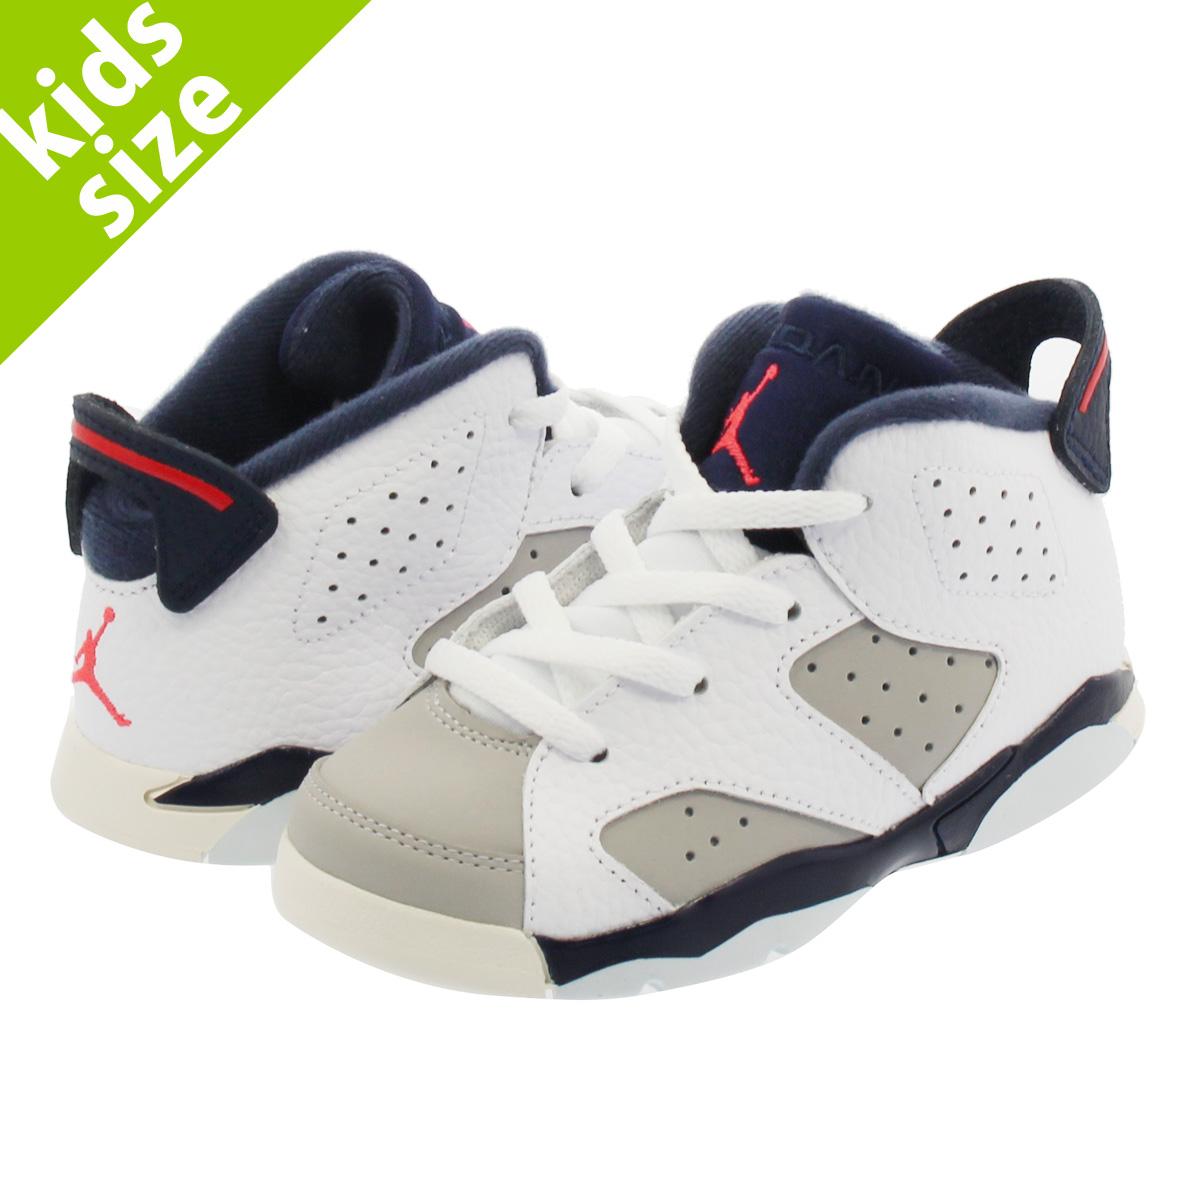 new concept fdd99 dbe62 NIKE AIR JORDAN 6 RETRO BT Nike Air Jordan 6 nostalgic BT WHITE INFRARED  23 NEUTRAL GREY OBSIDIAN 384,667-104